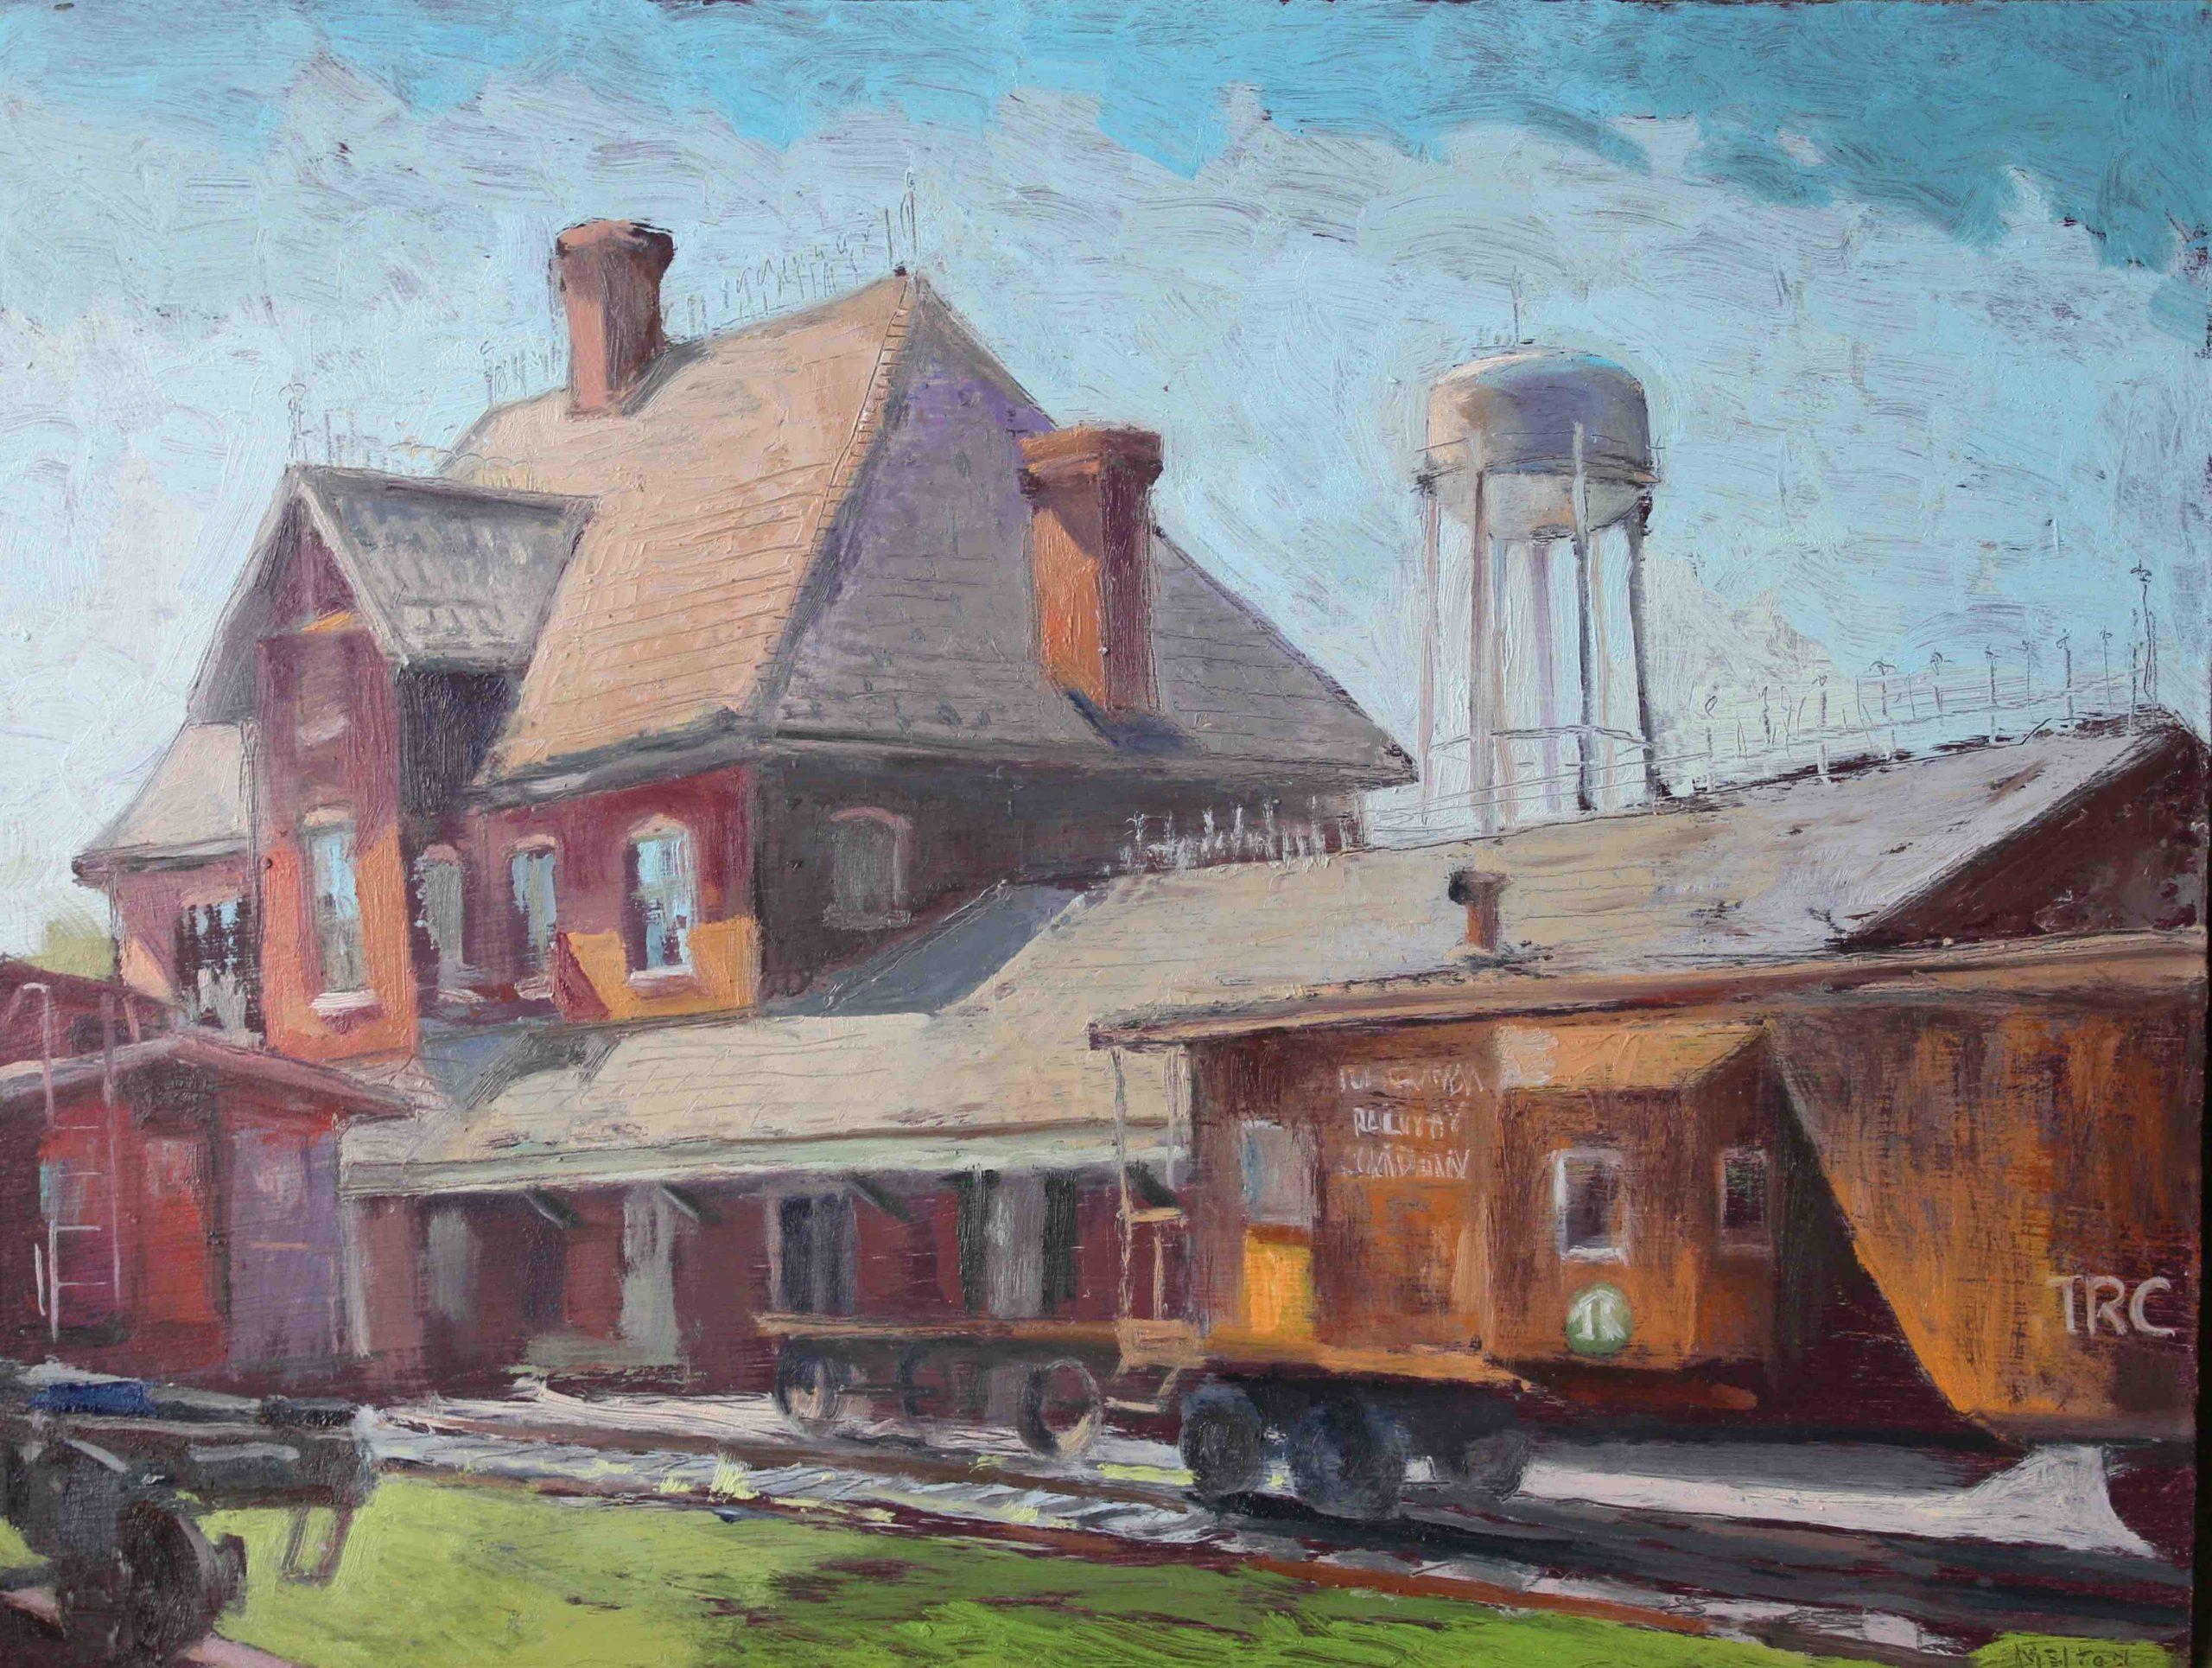 Benny Melton Painting